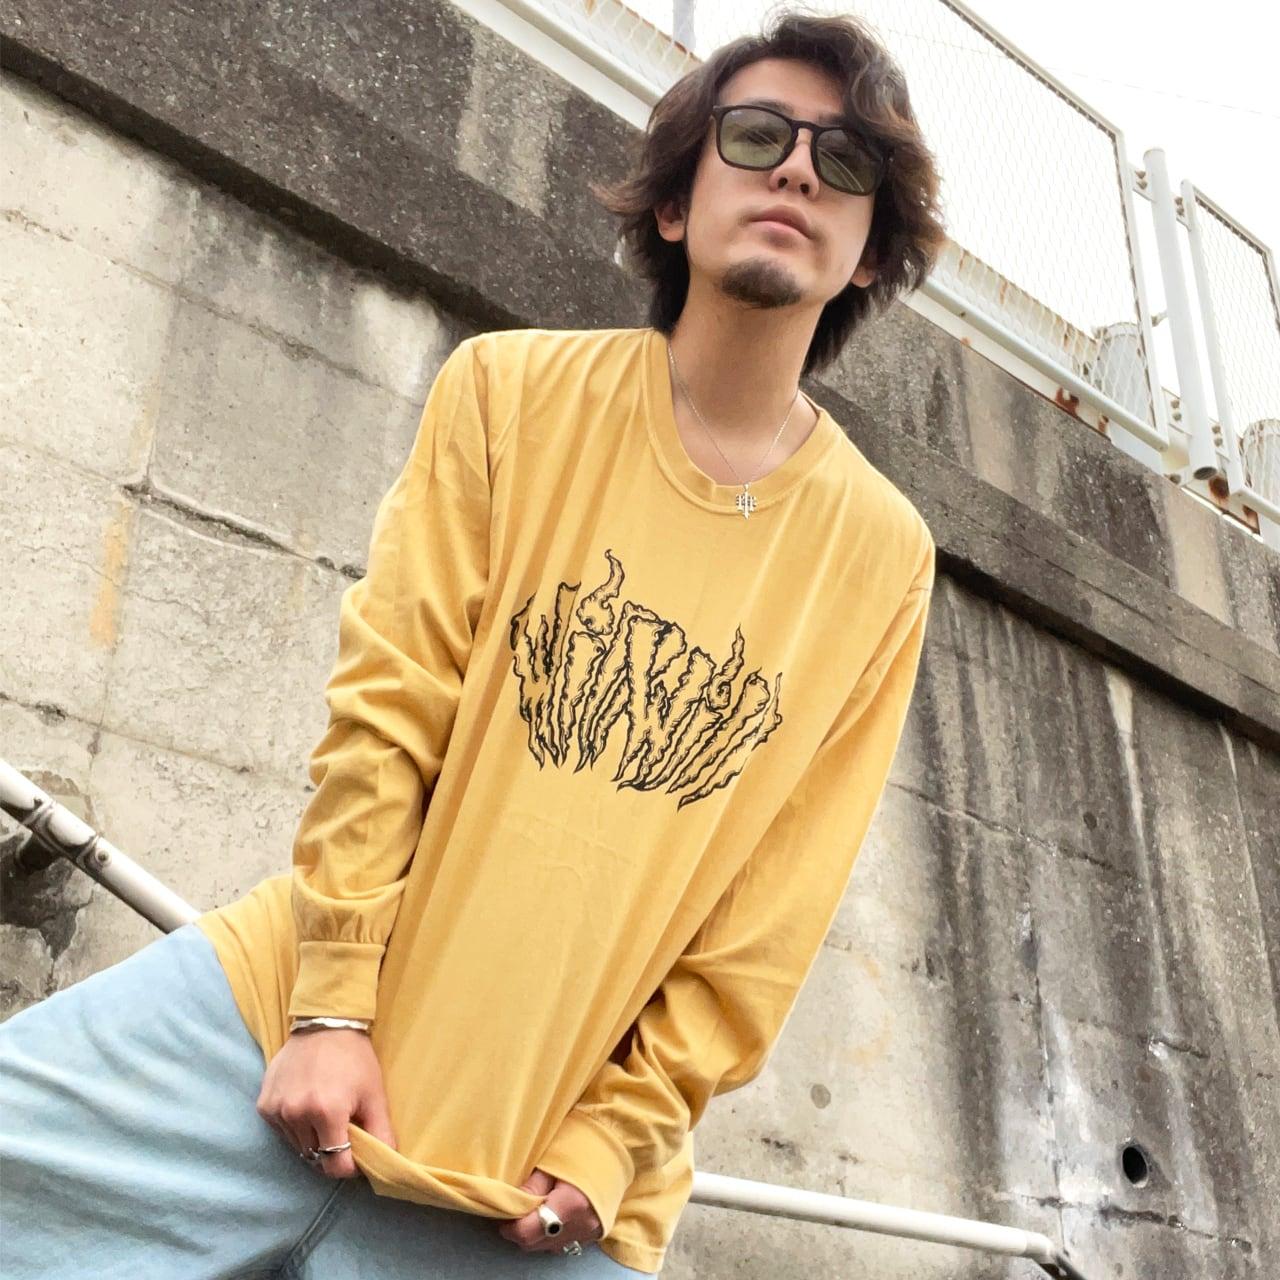 【WillxWill × Musollon】スペシャルコラボレーション Logo Long Sleeve Yellow